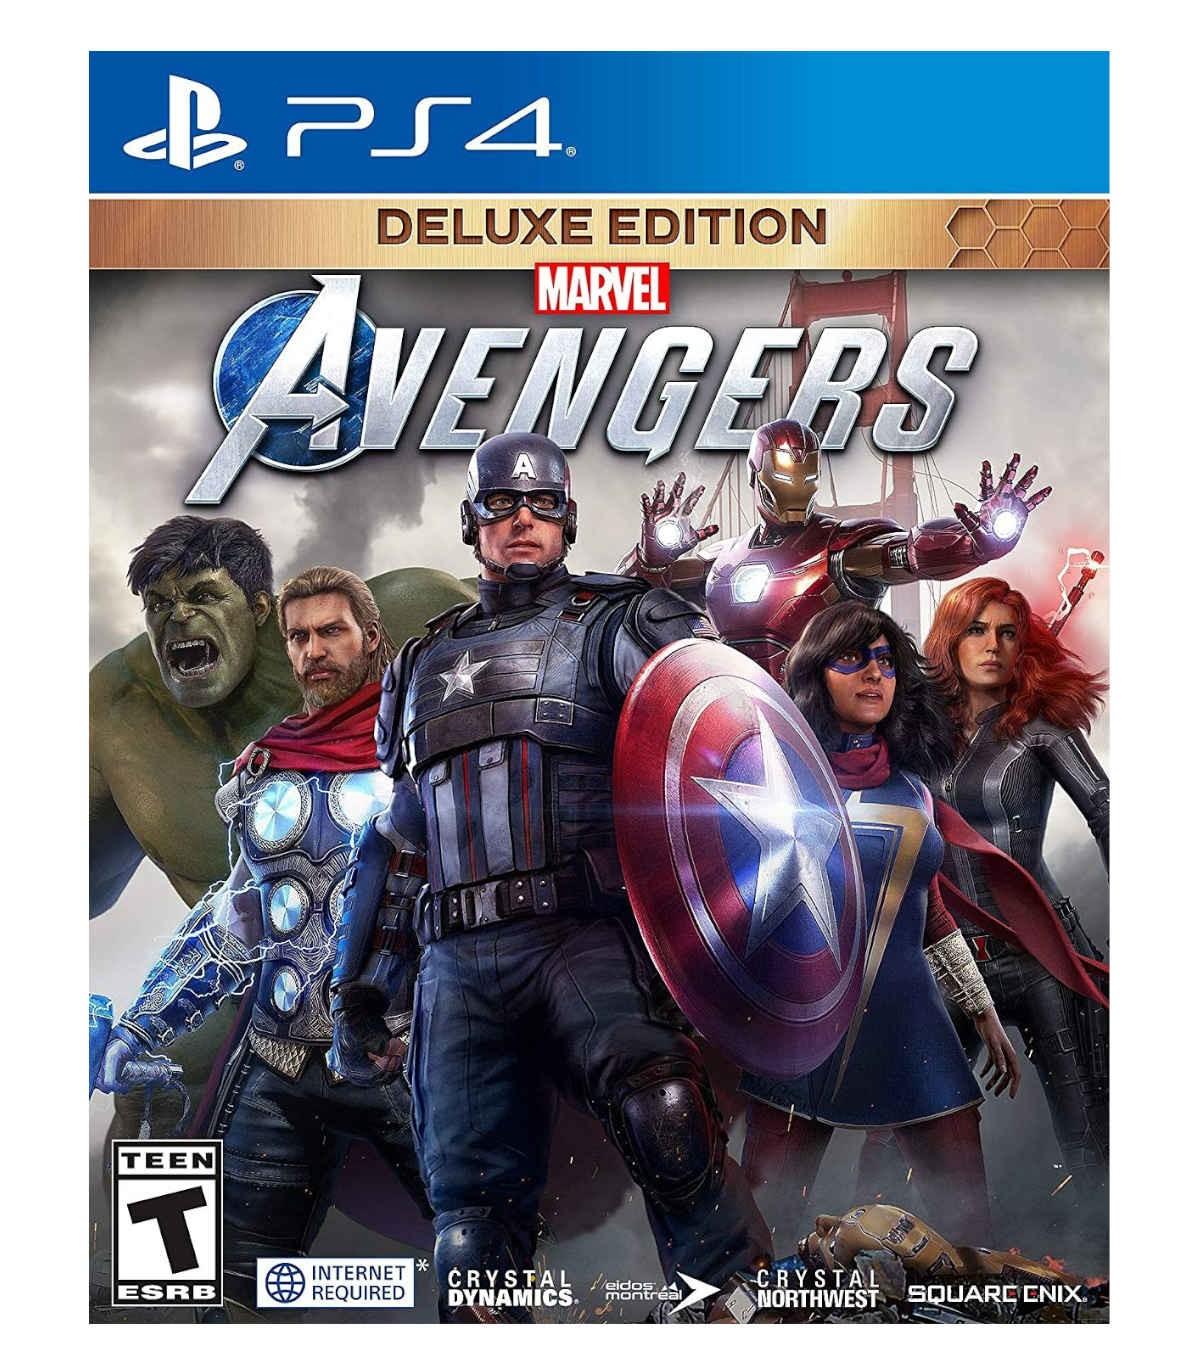 بازی Marvel's Avengers: Deluxe Edition - پلی استیشن 4